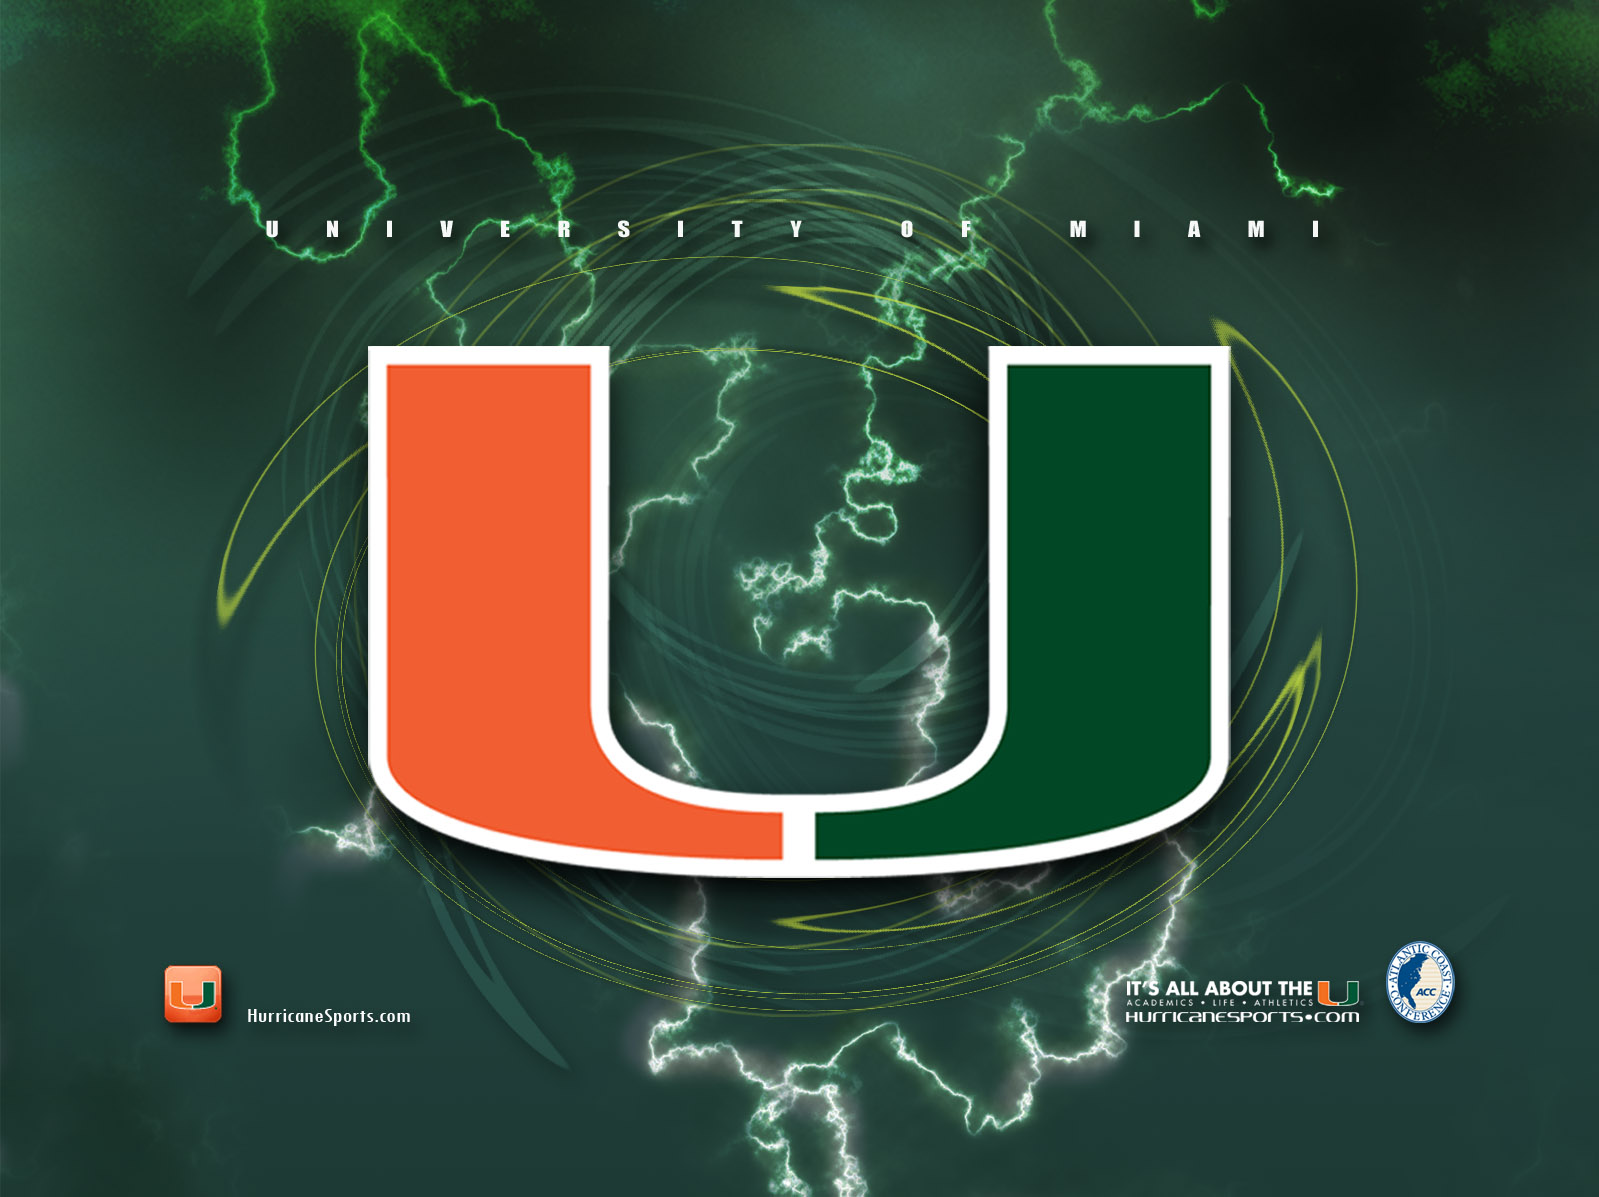 Miami Hurricanes The U 1600 X 1200 1280 800 1599x1197